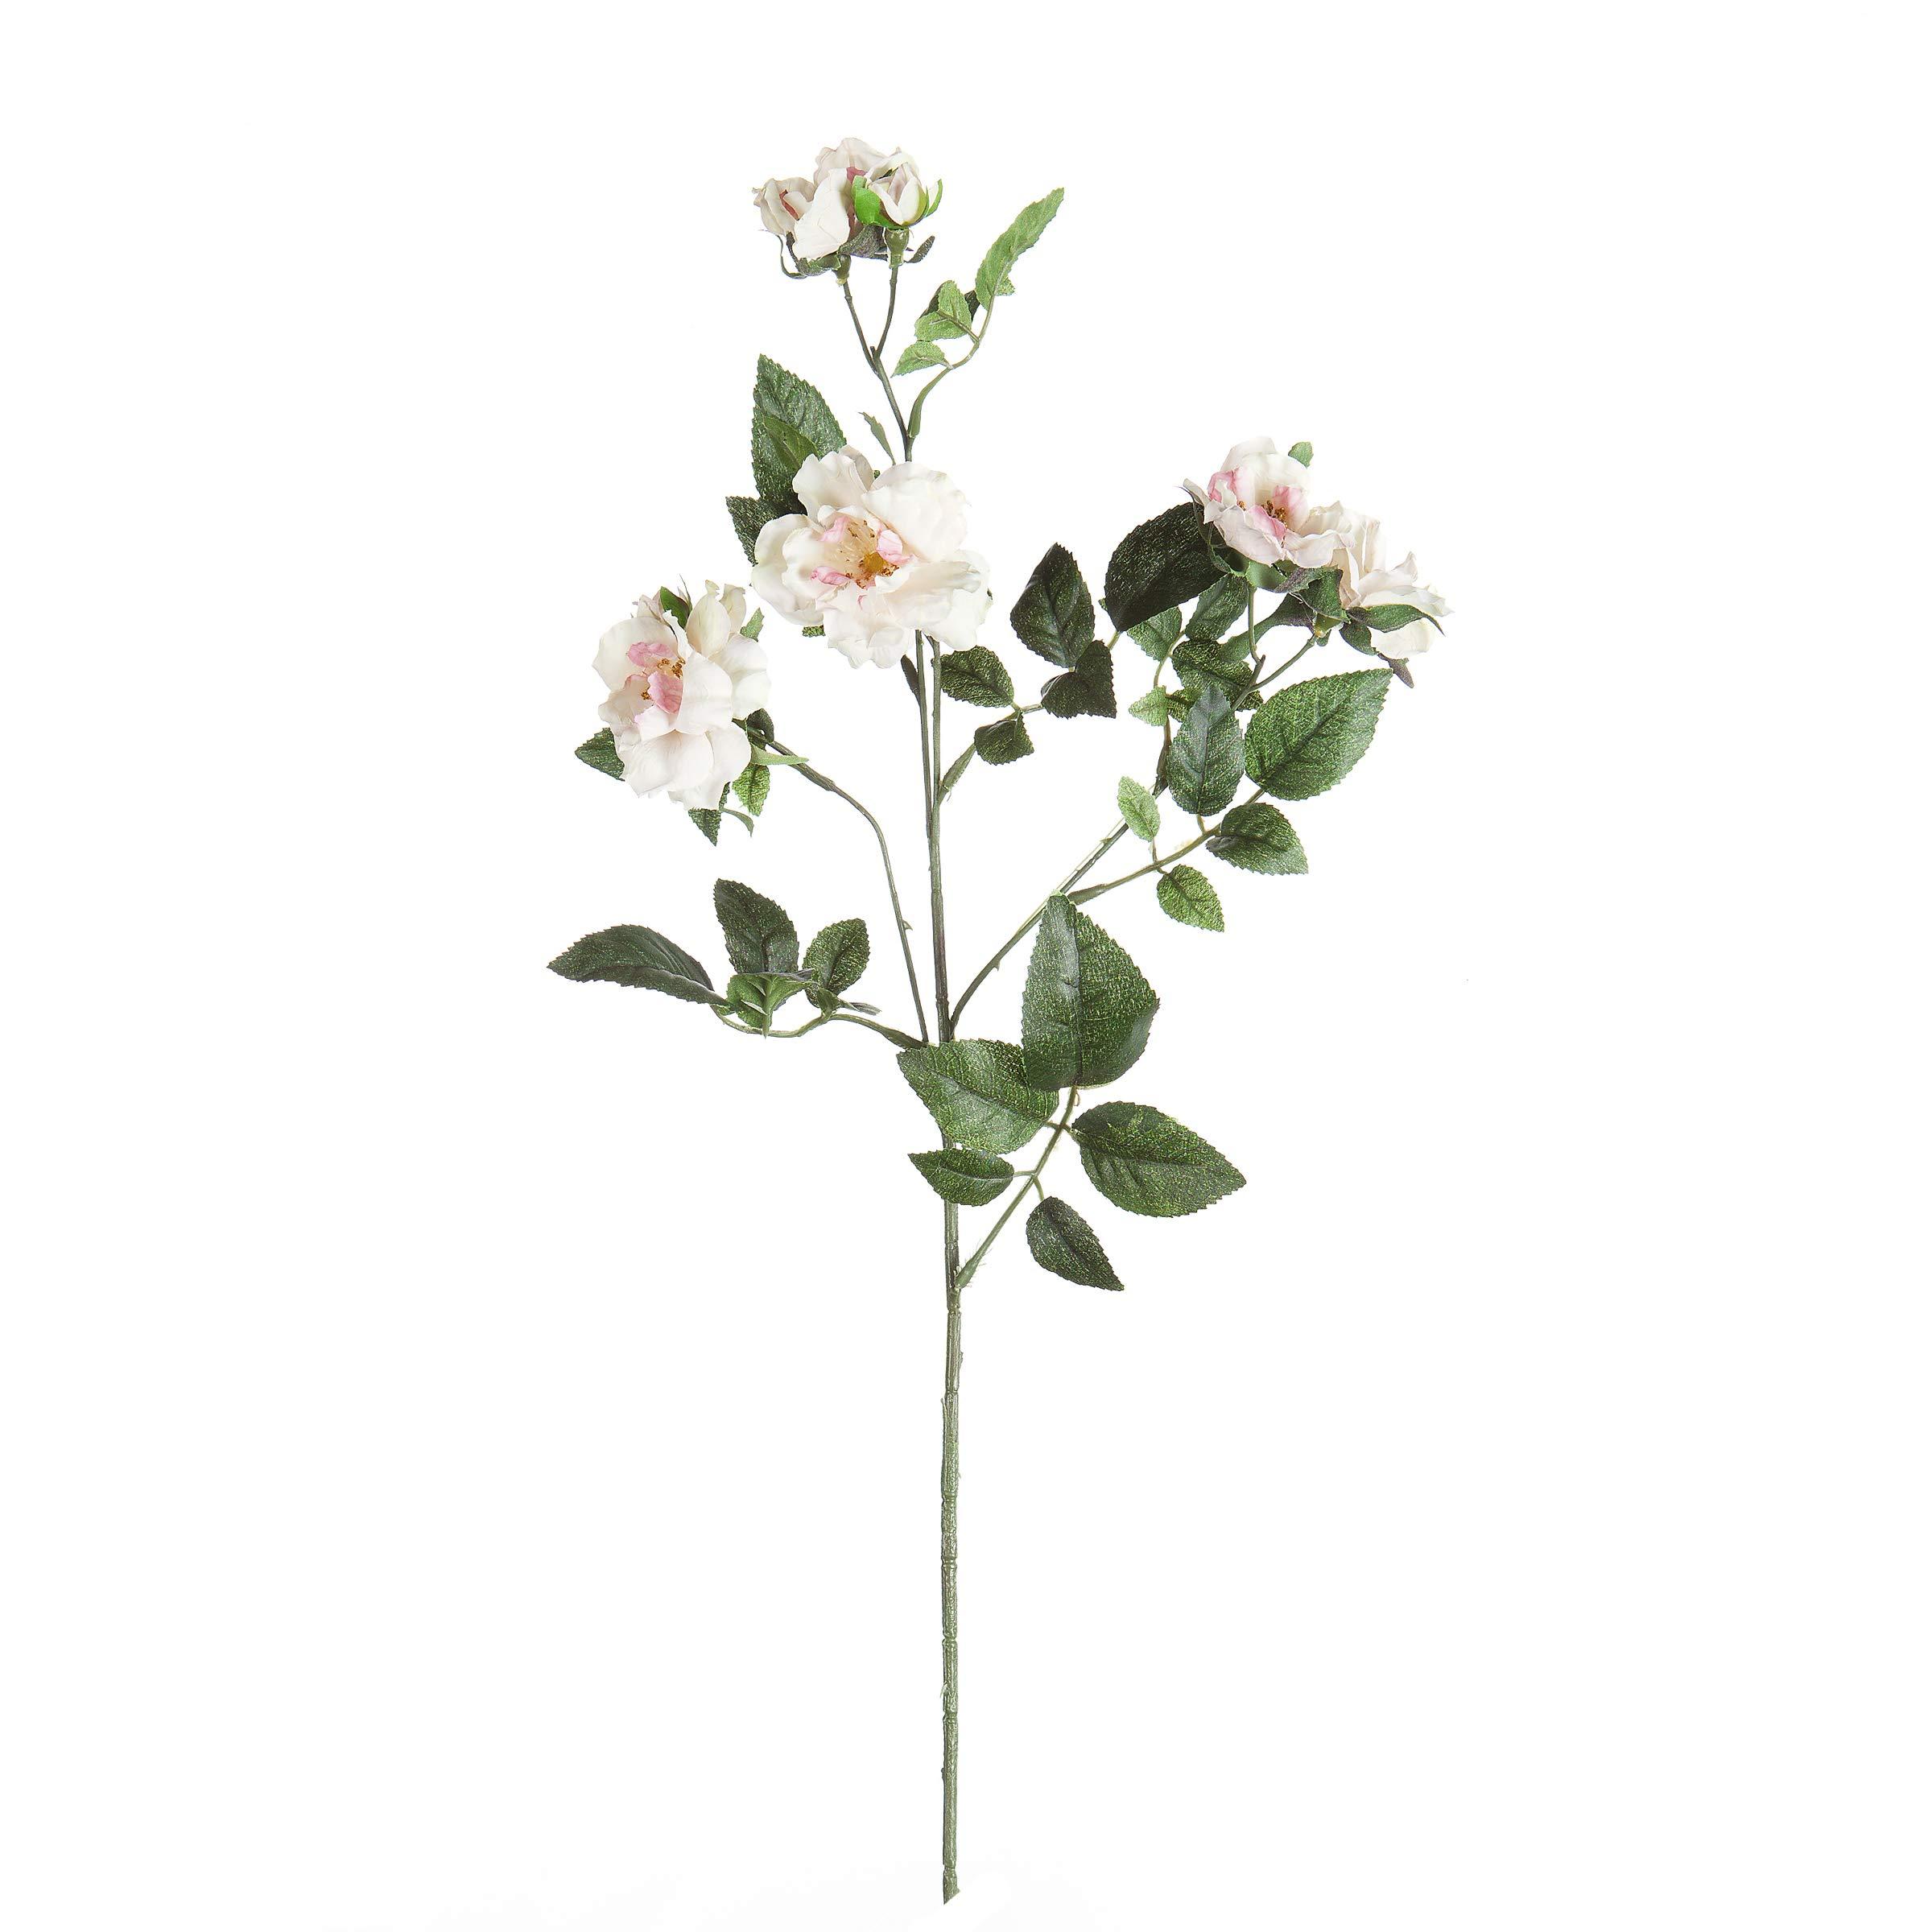 Darice SQ14G5011-AL200 Everyday Long Stem Wild Rose Spray, 31'', Cream Pink